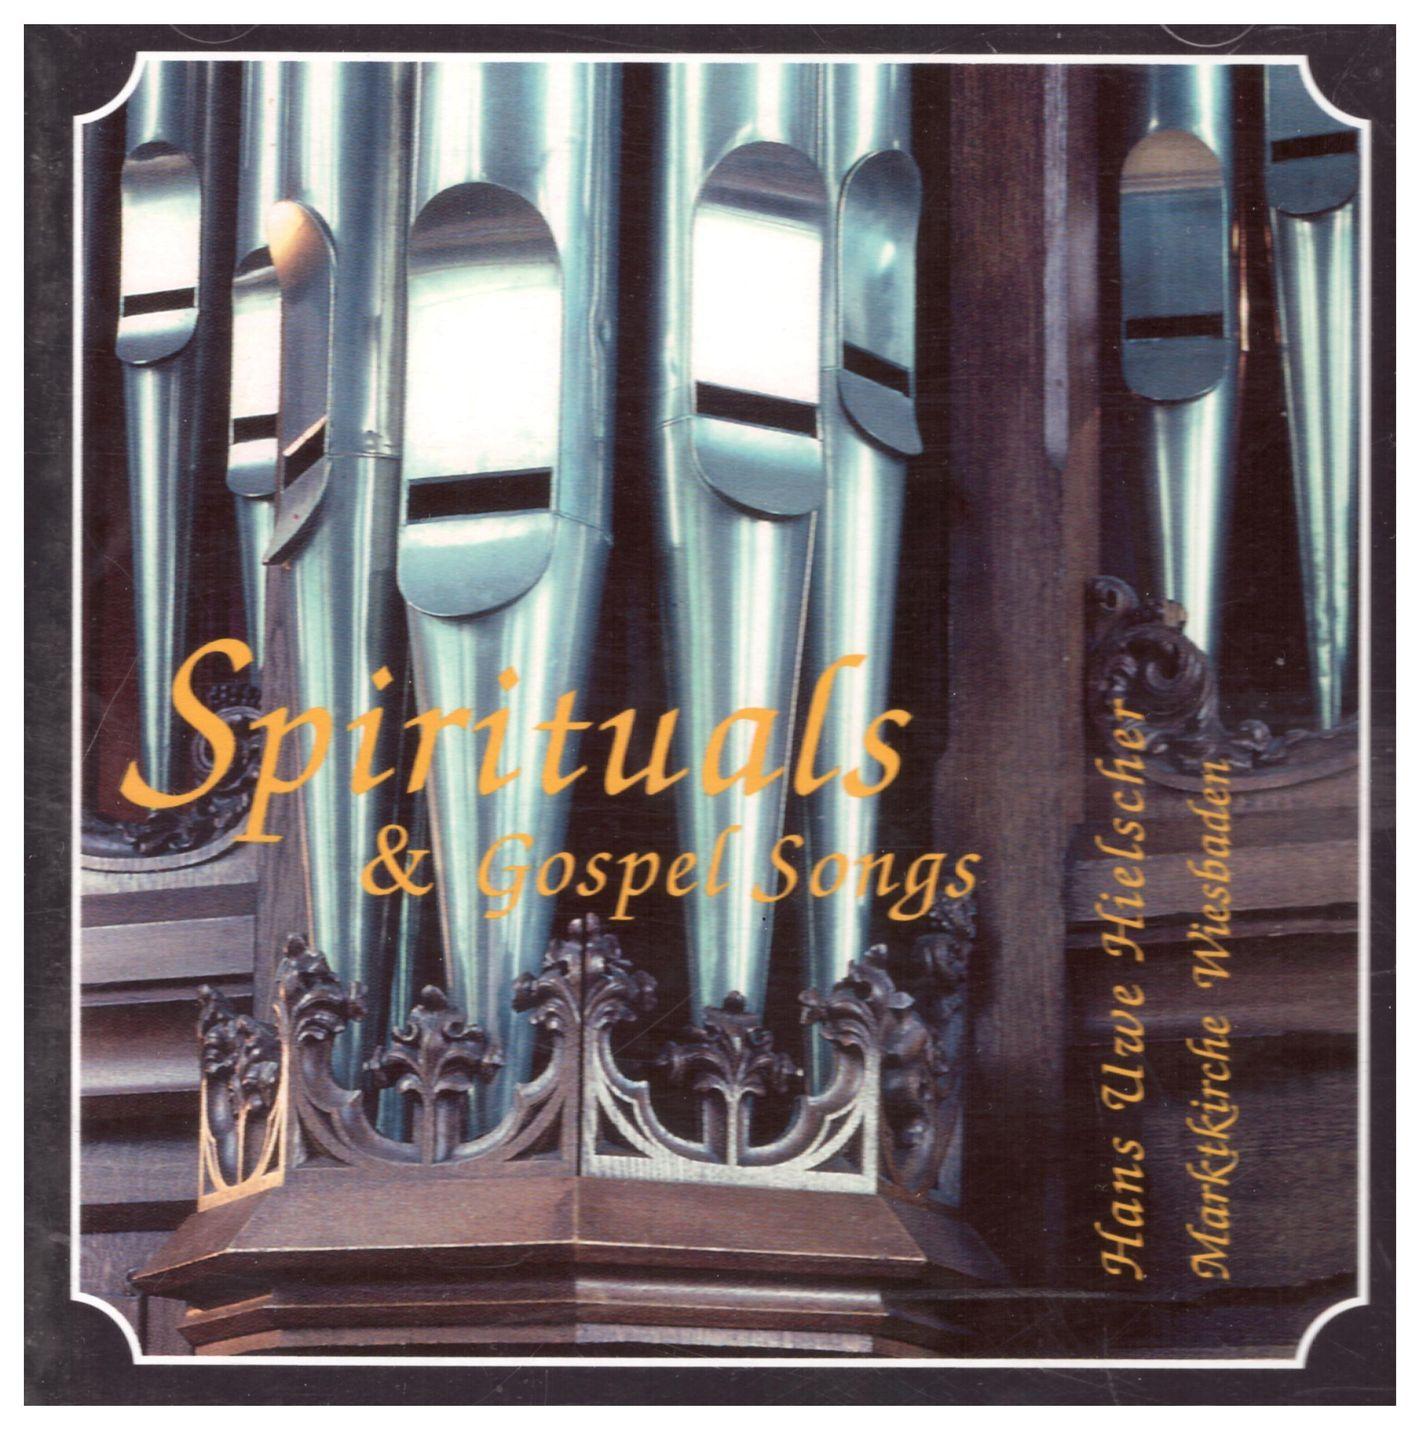 Spirituals and Gospel Songs